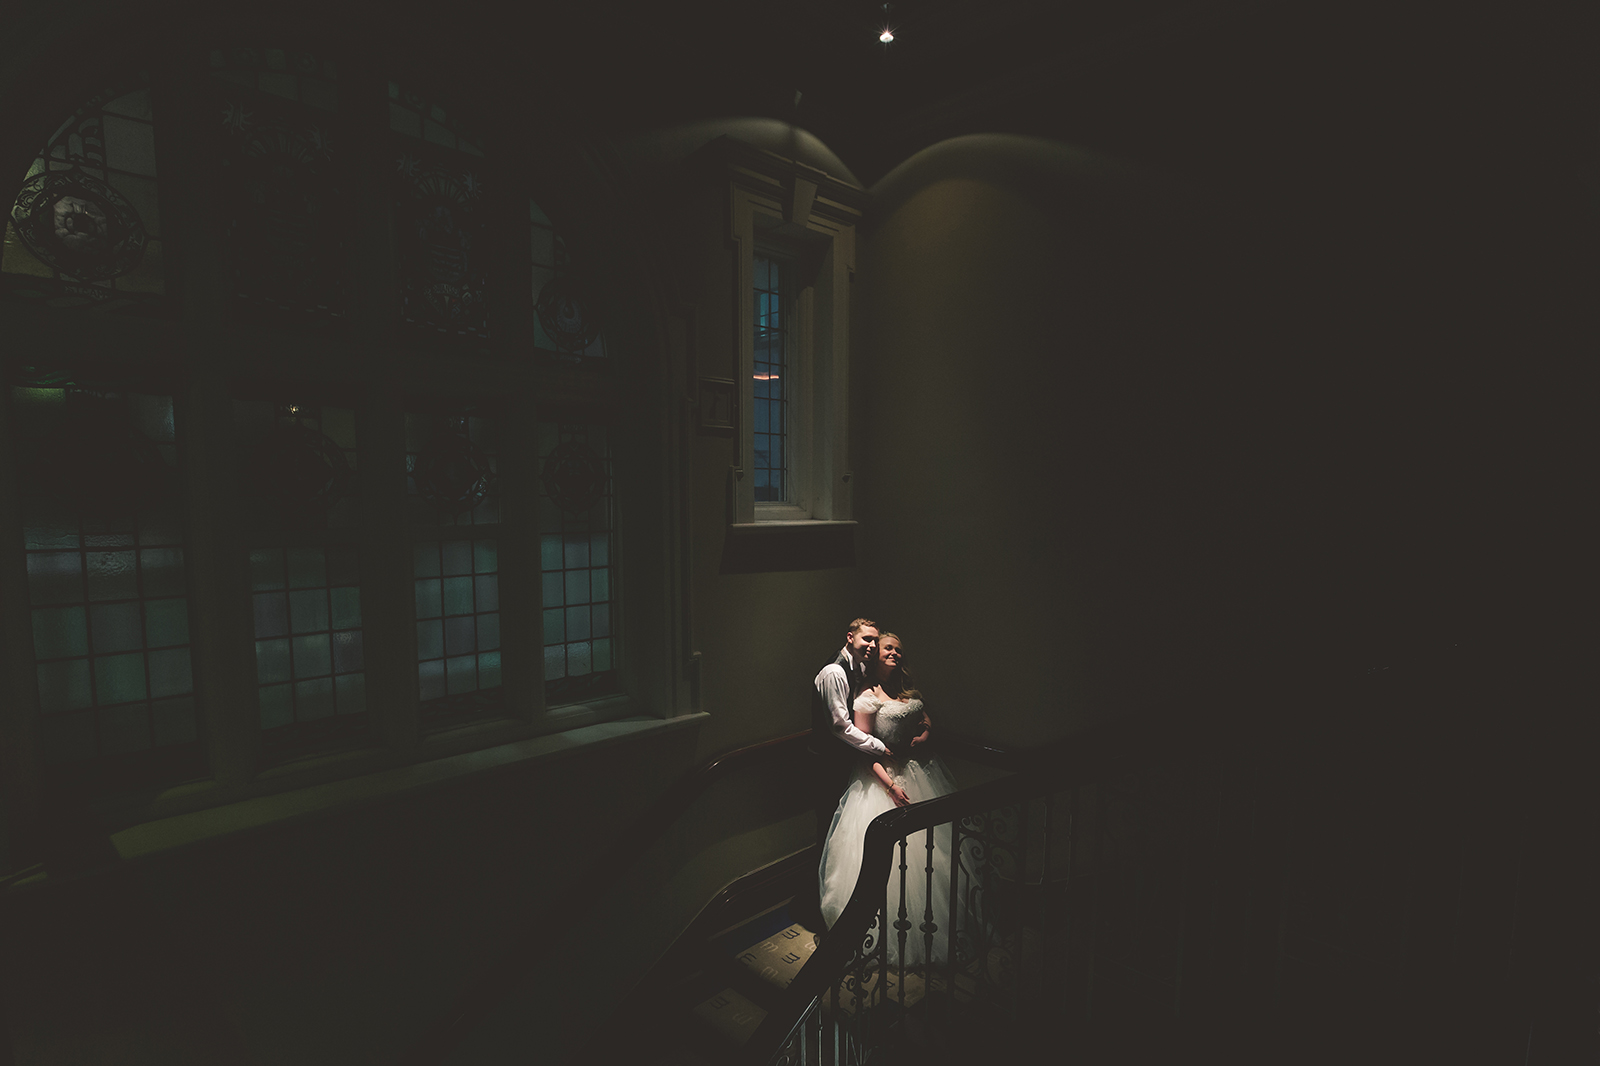 Wedding photographer Morgans Hotel Swansea